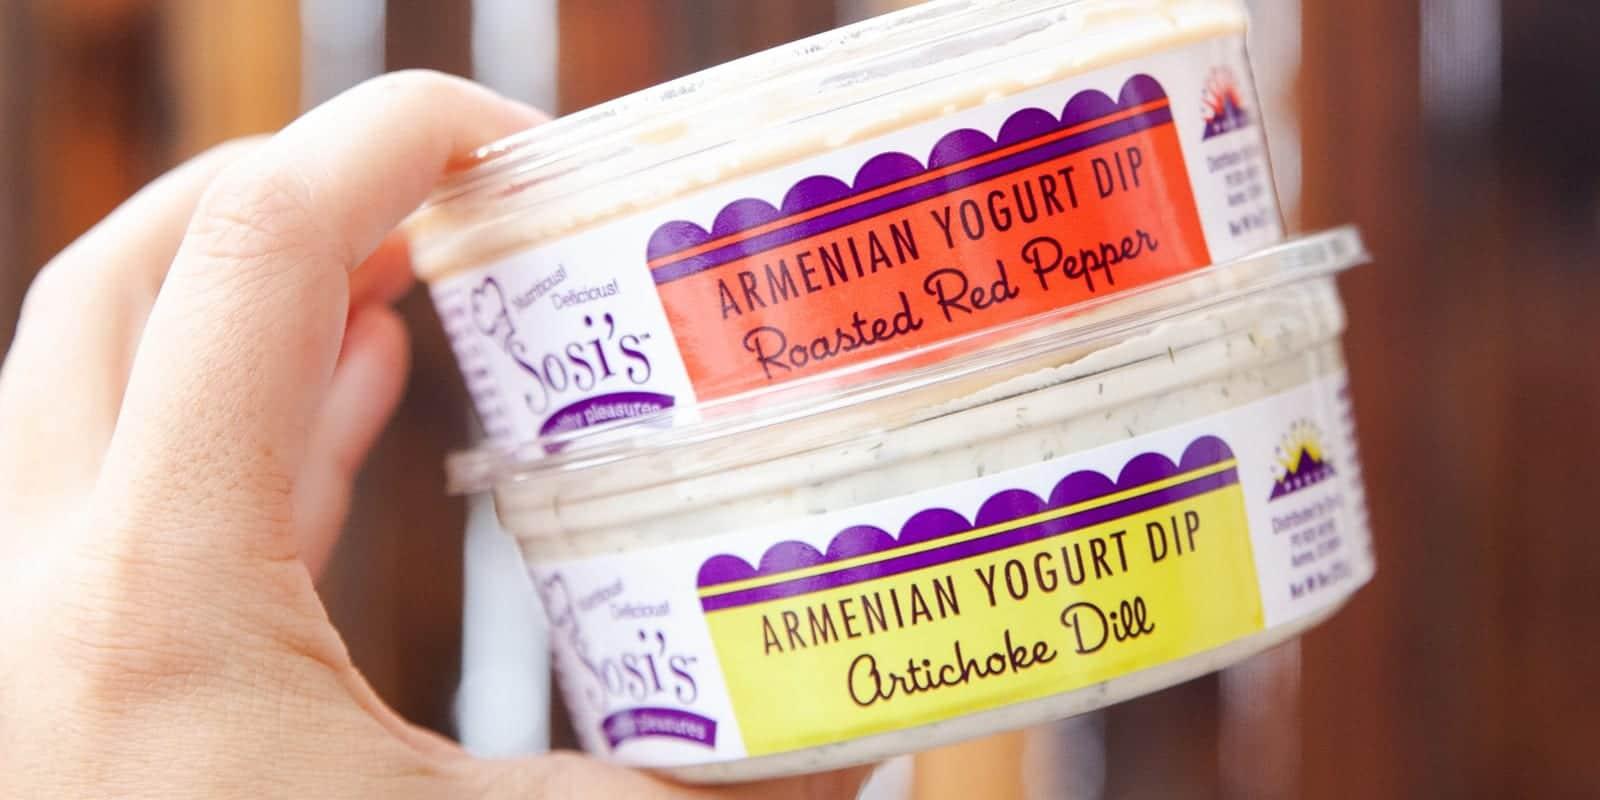 Image of Sosi's Healthy Pleasures red roasted pepper and artichoke dill yogurt dip